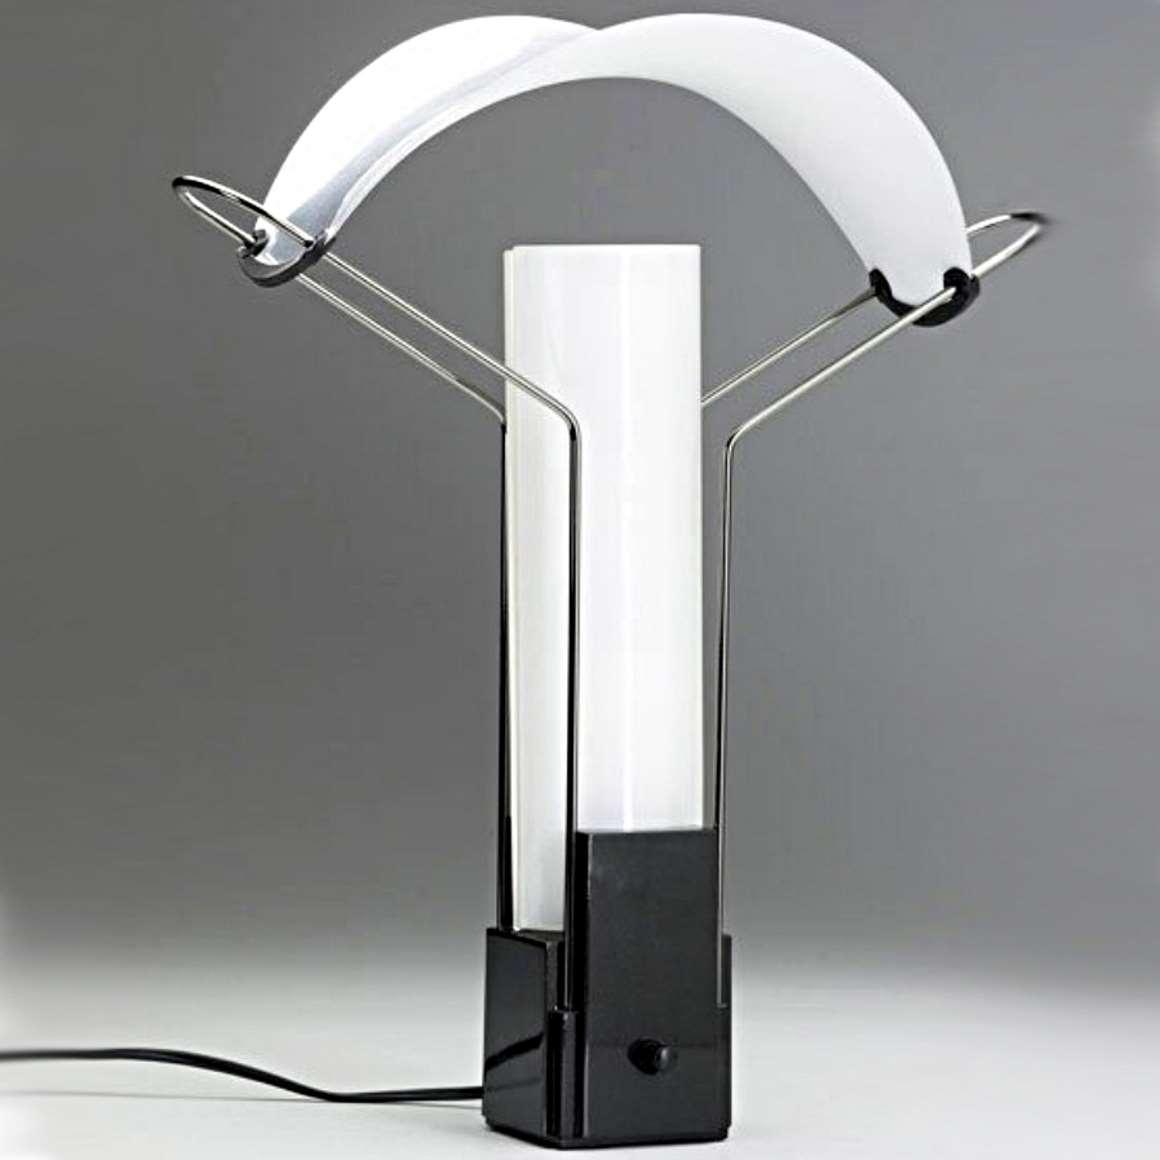 Arteluce Palio Table Lamp - white version